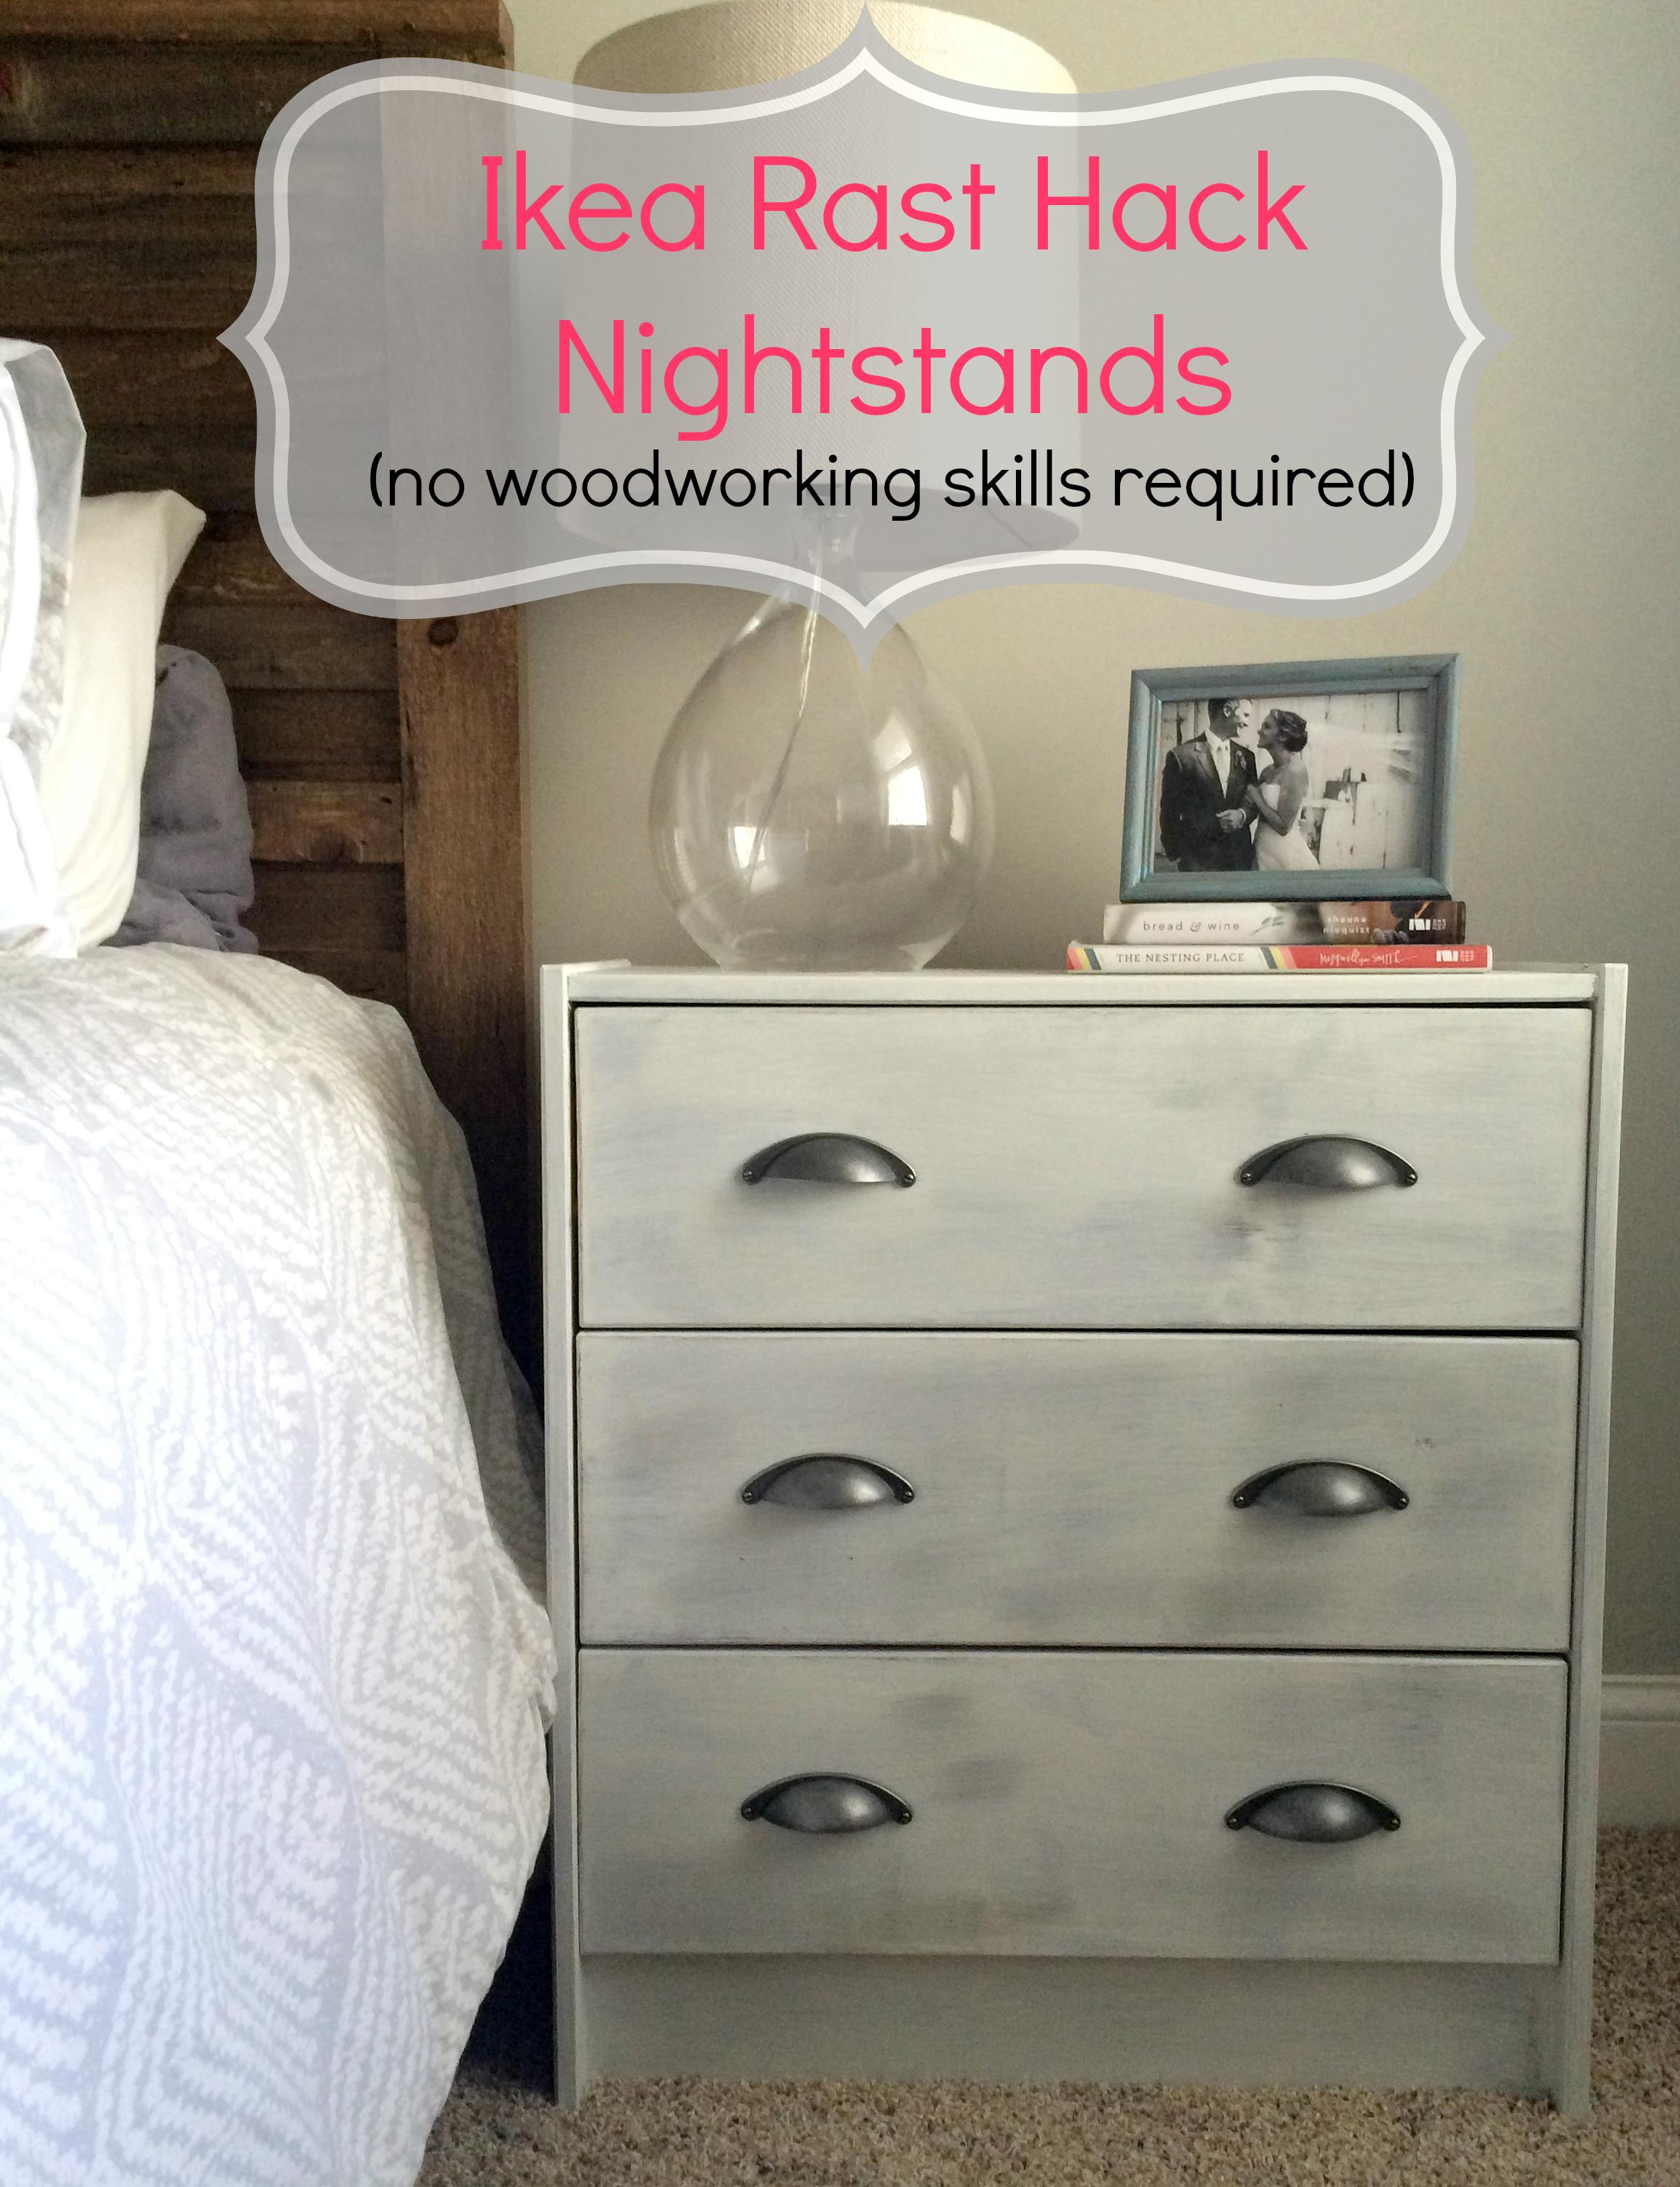 ikea rast hack a nightstand makeover - Ikea Rast